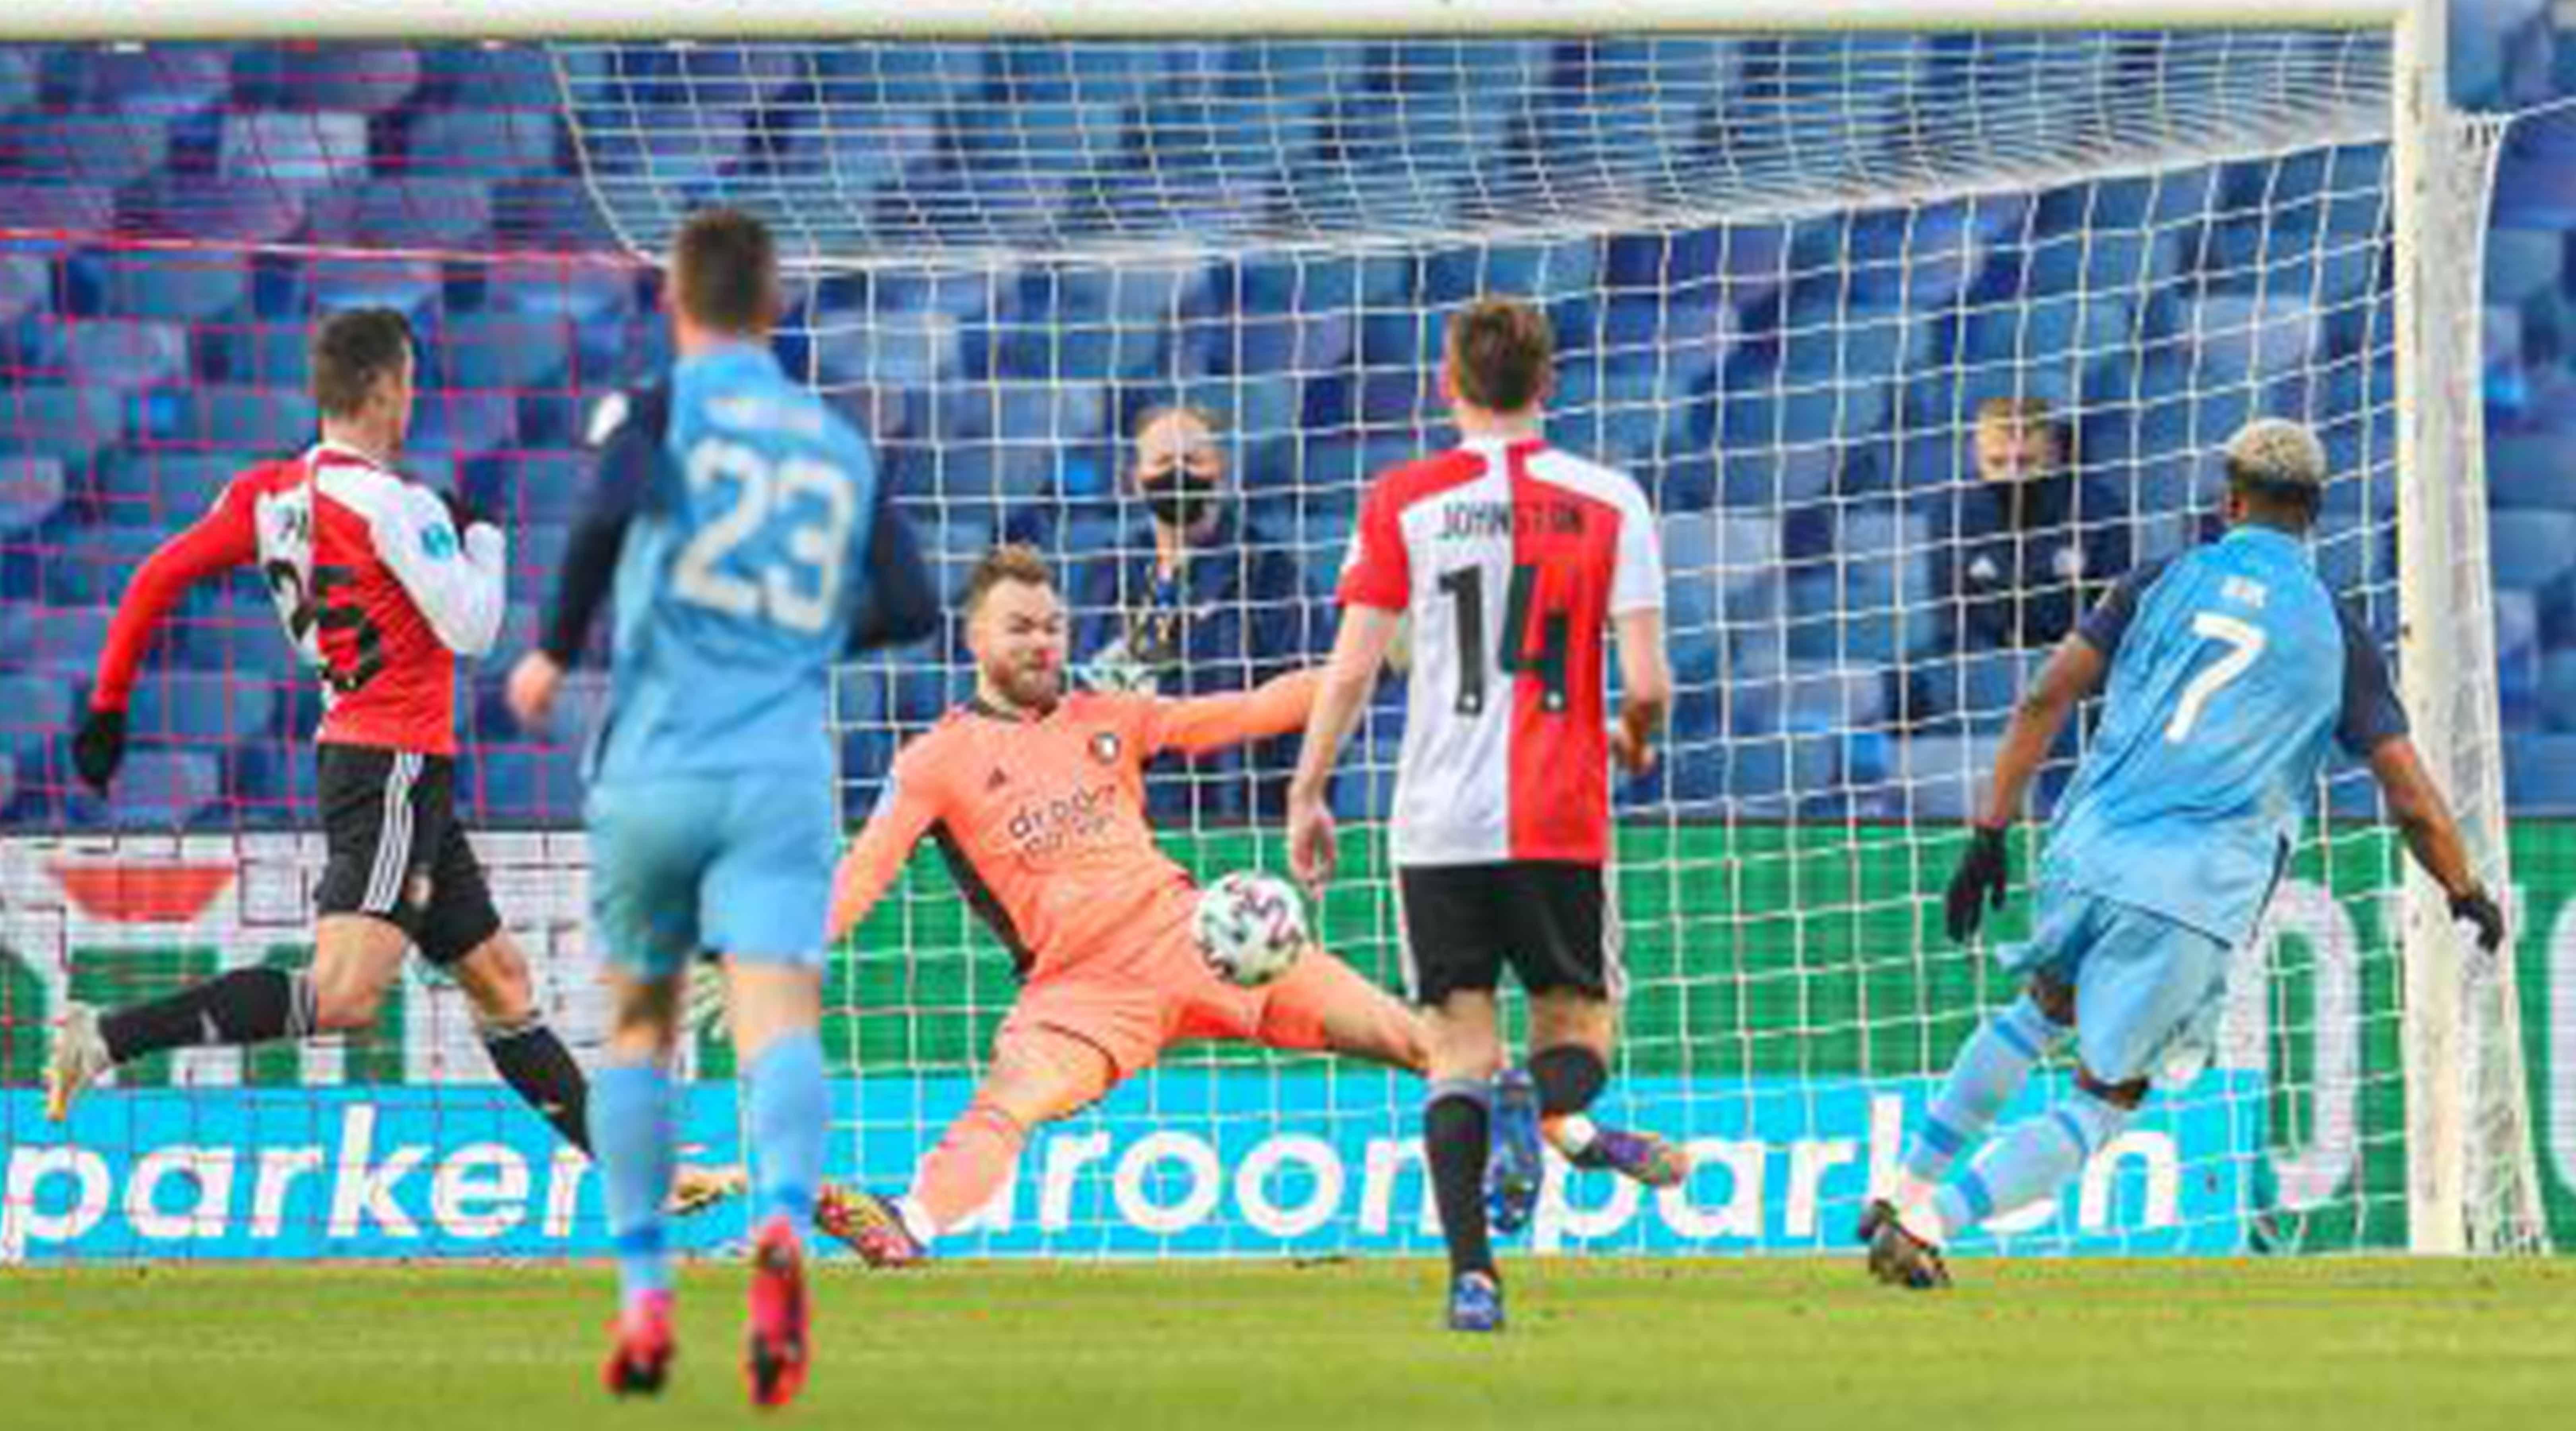 Keeper Marsman verruilt Feyenoord voor Inter Miami CF